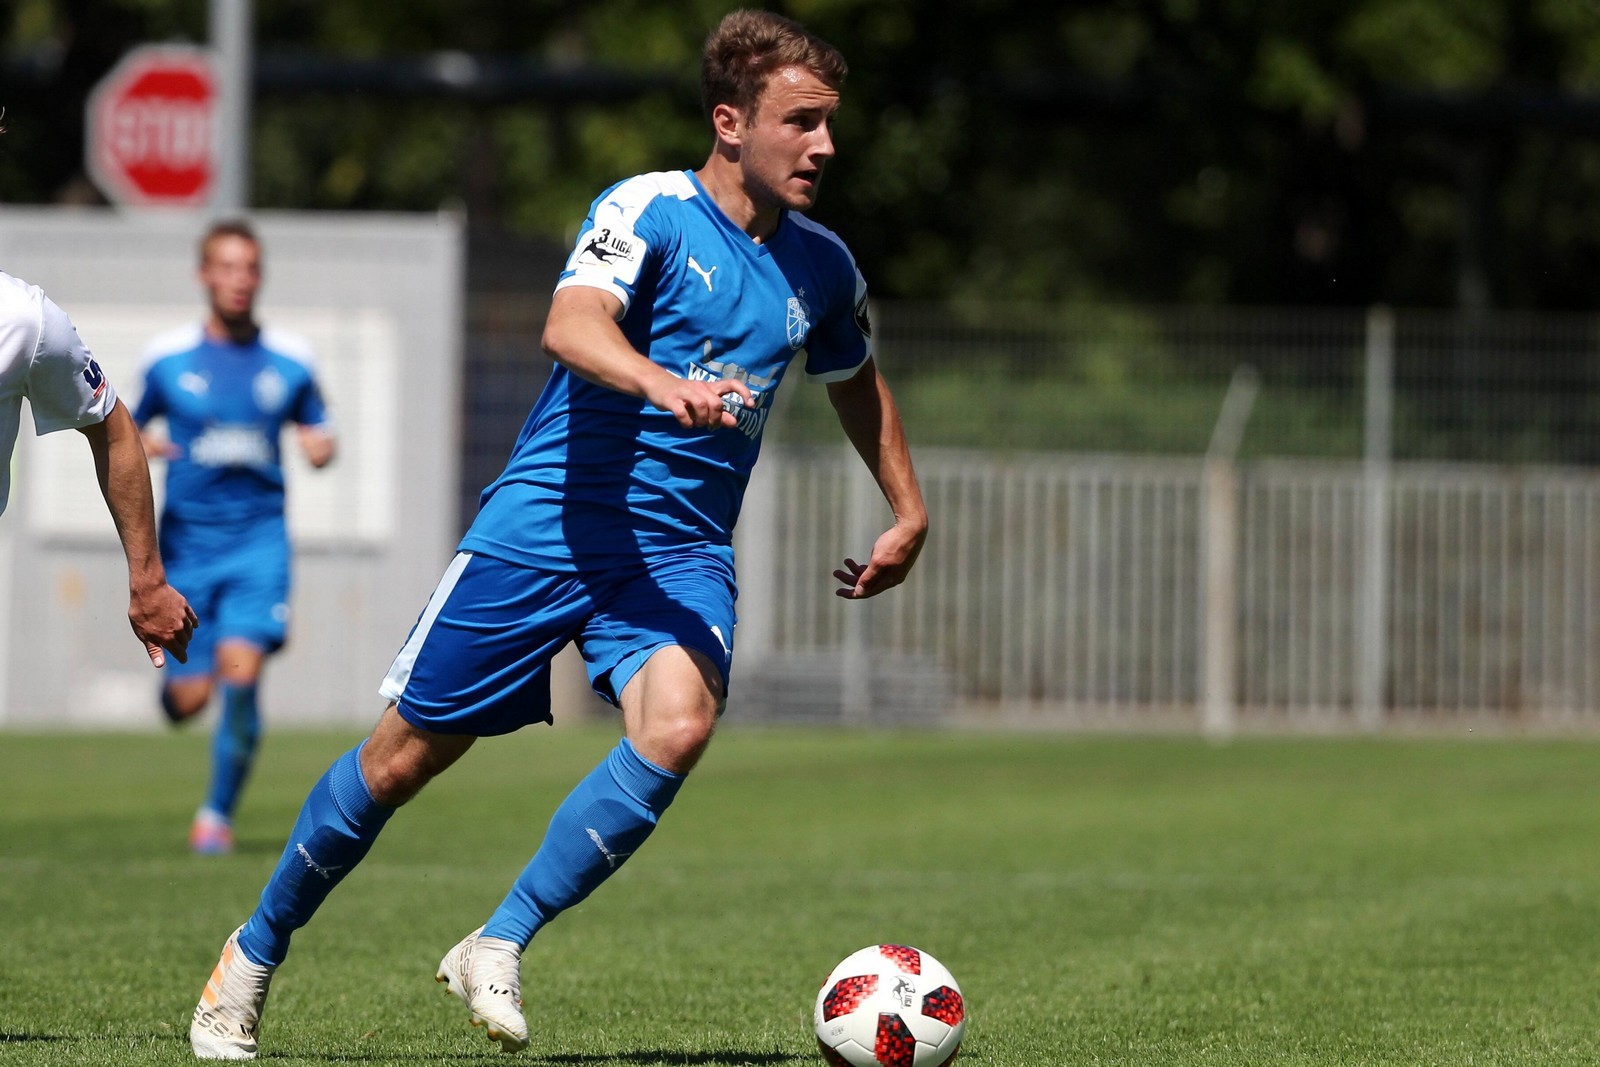 Denis Jäpel vom FC Carl Zeiss Jena